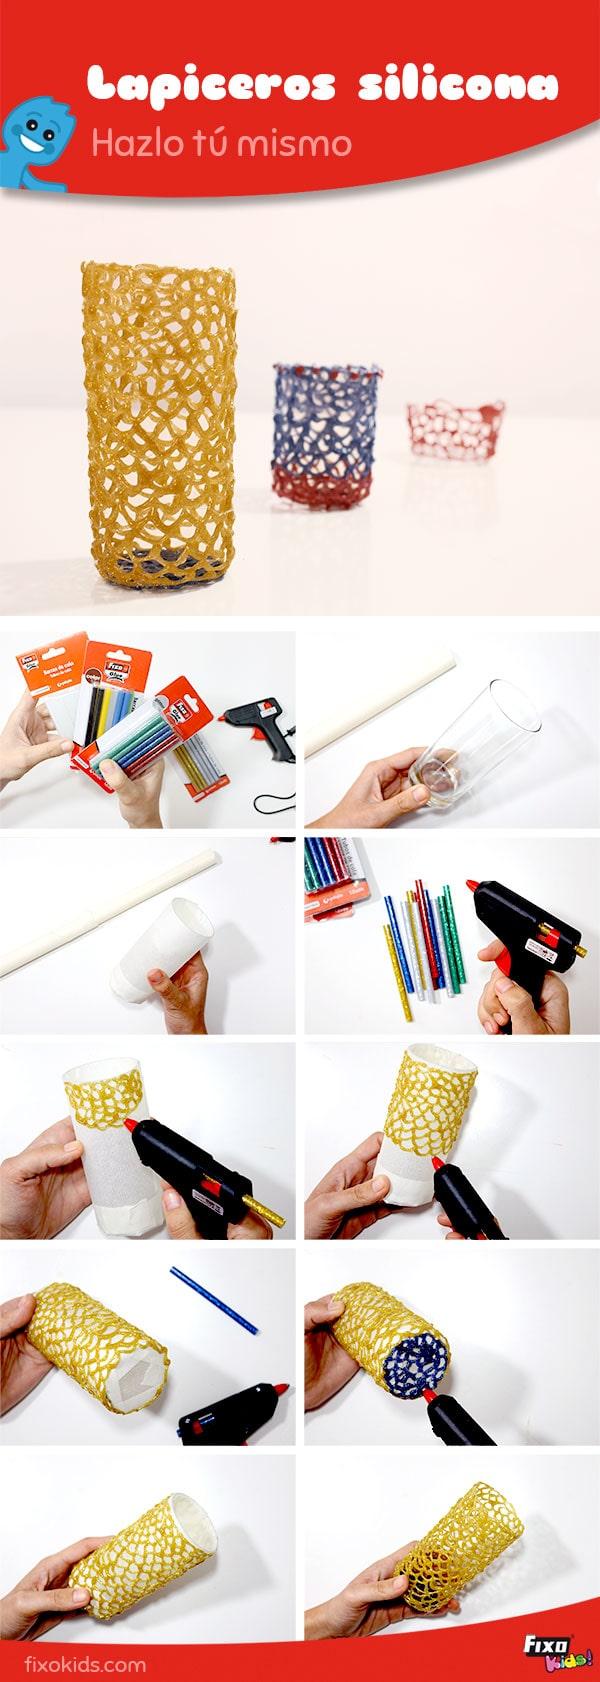 tutorial lapiceros con silicona caliente